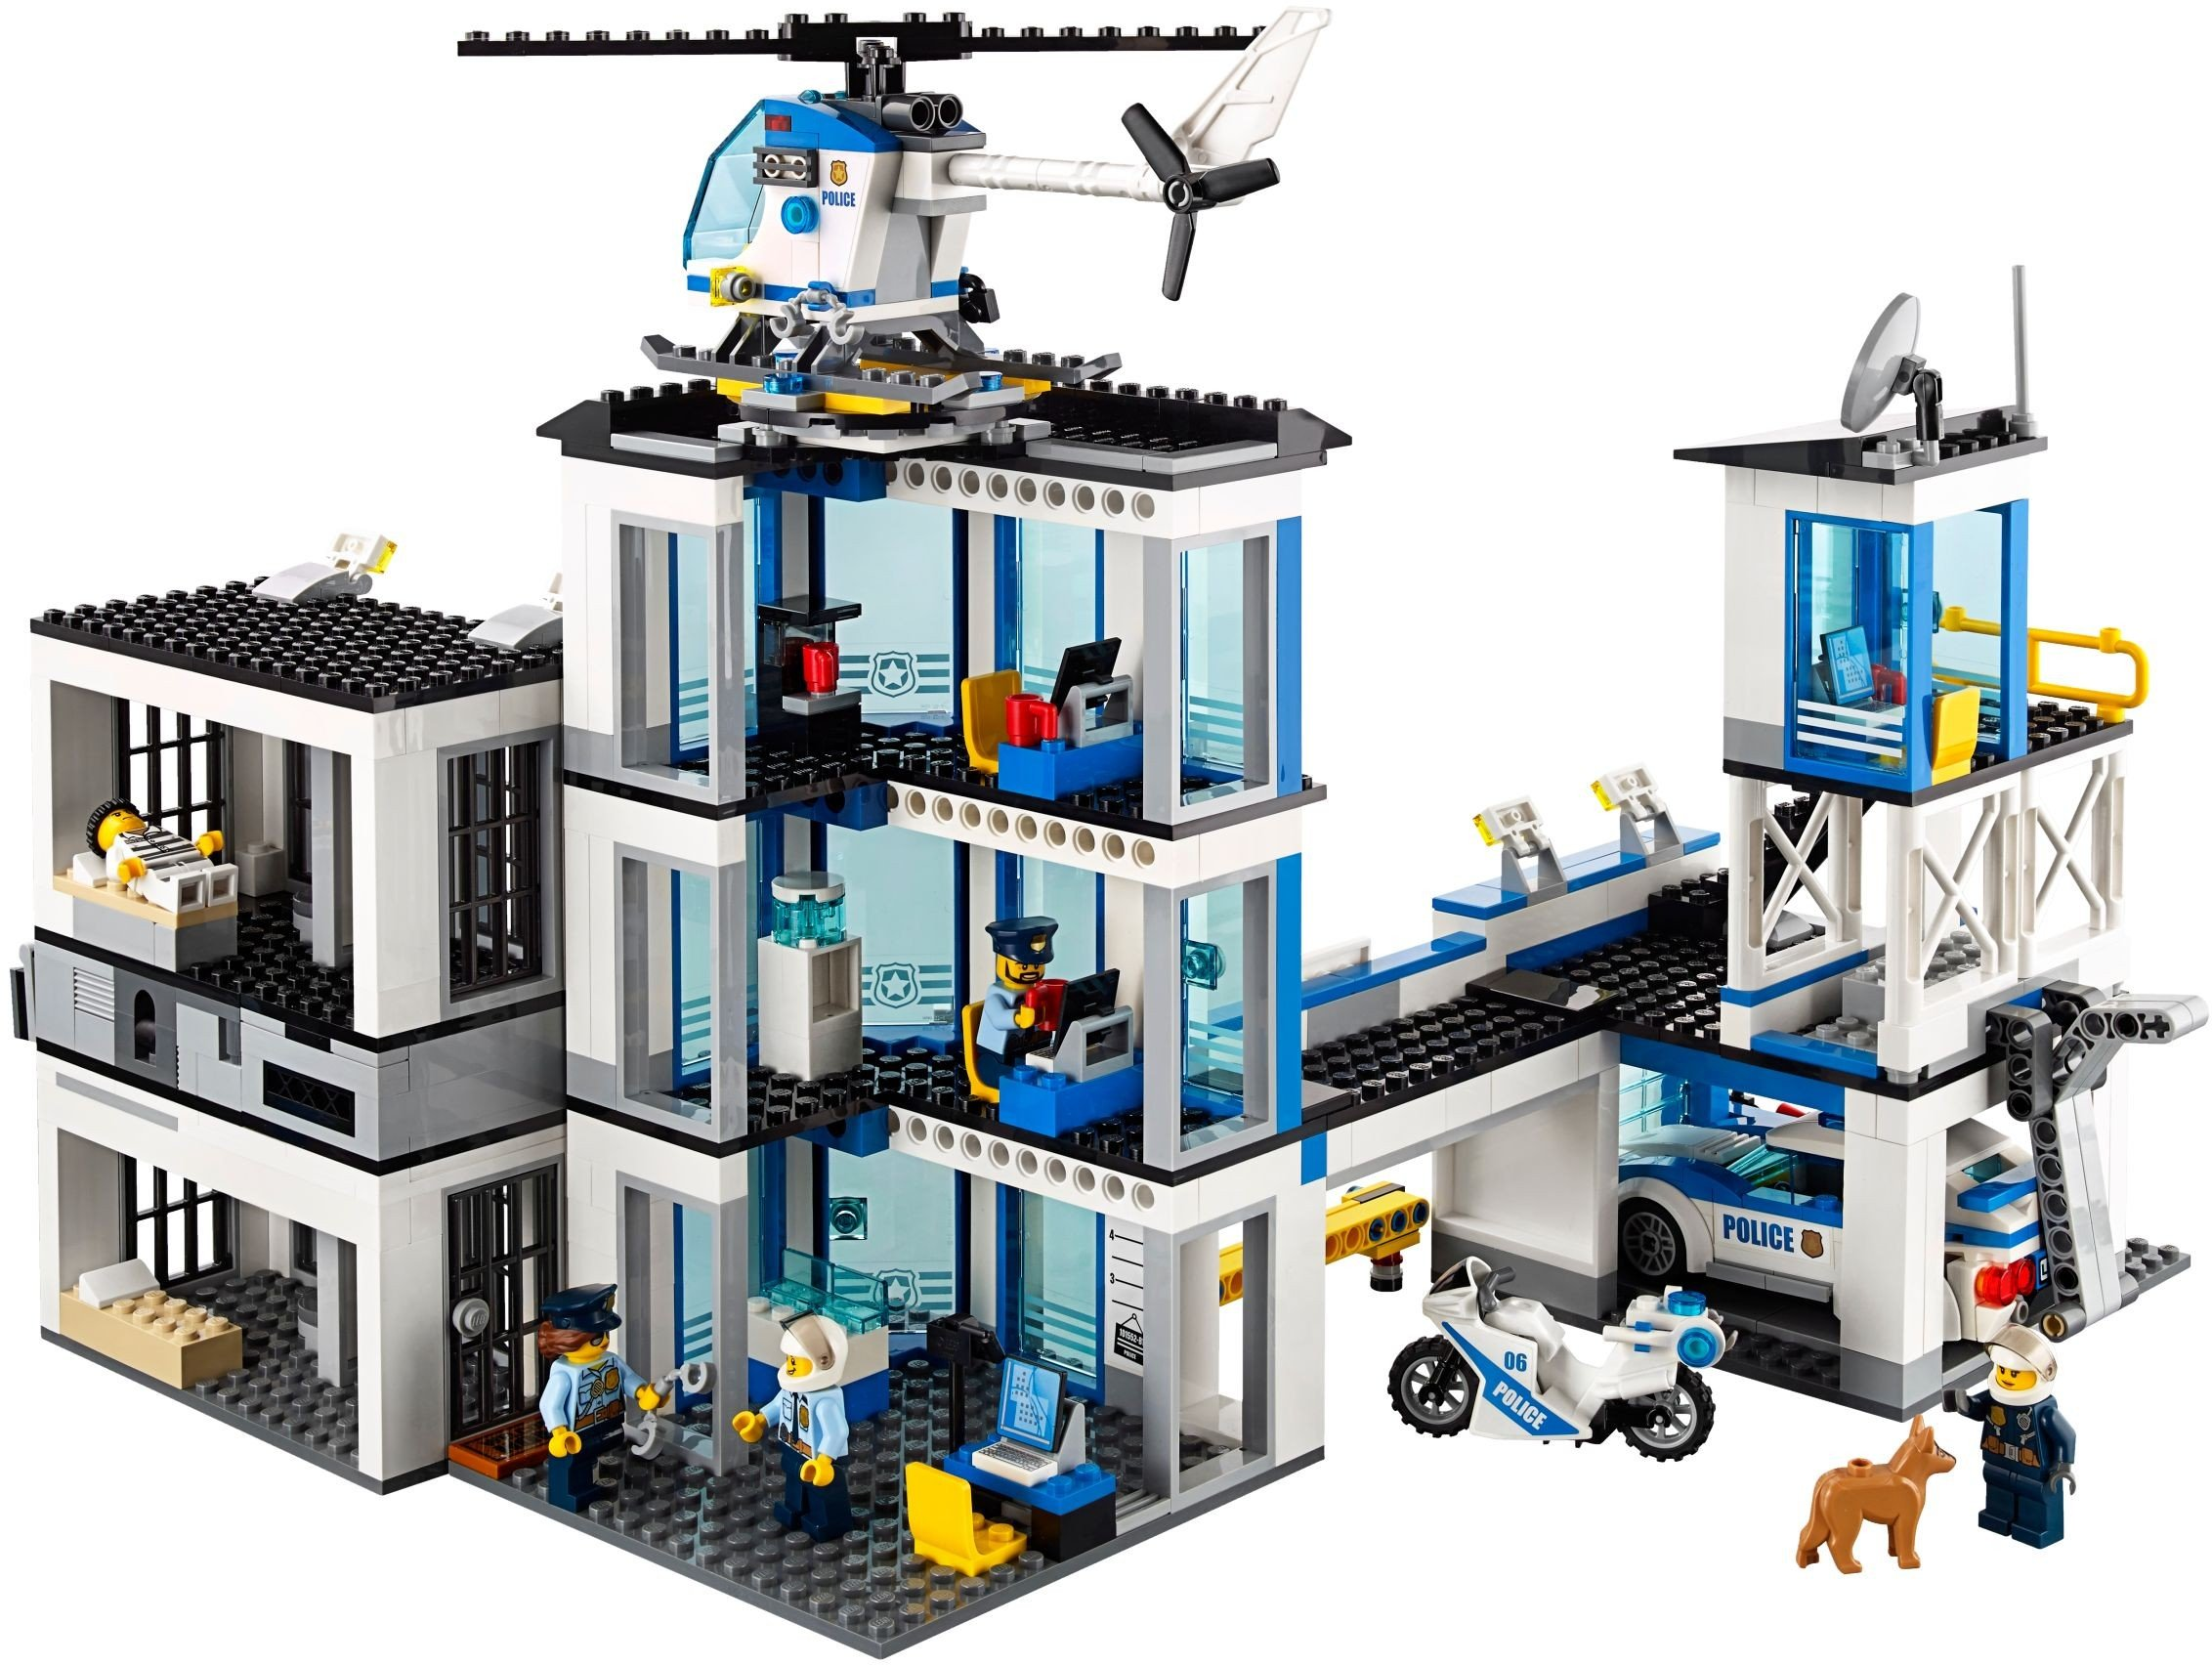 Kaufe LEGO City - Police Station (60141)